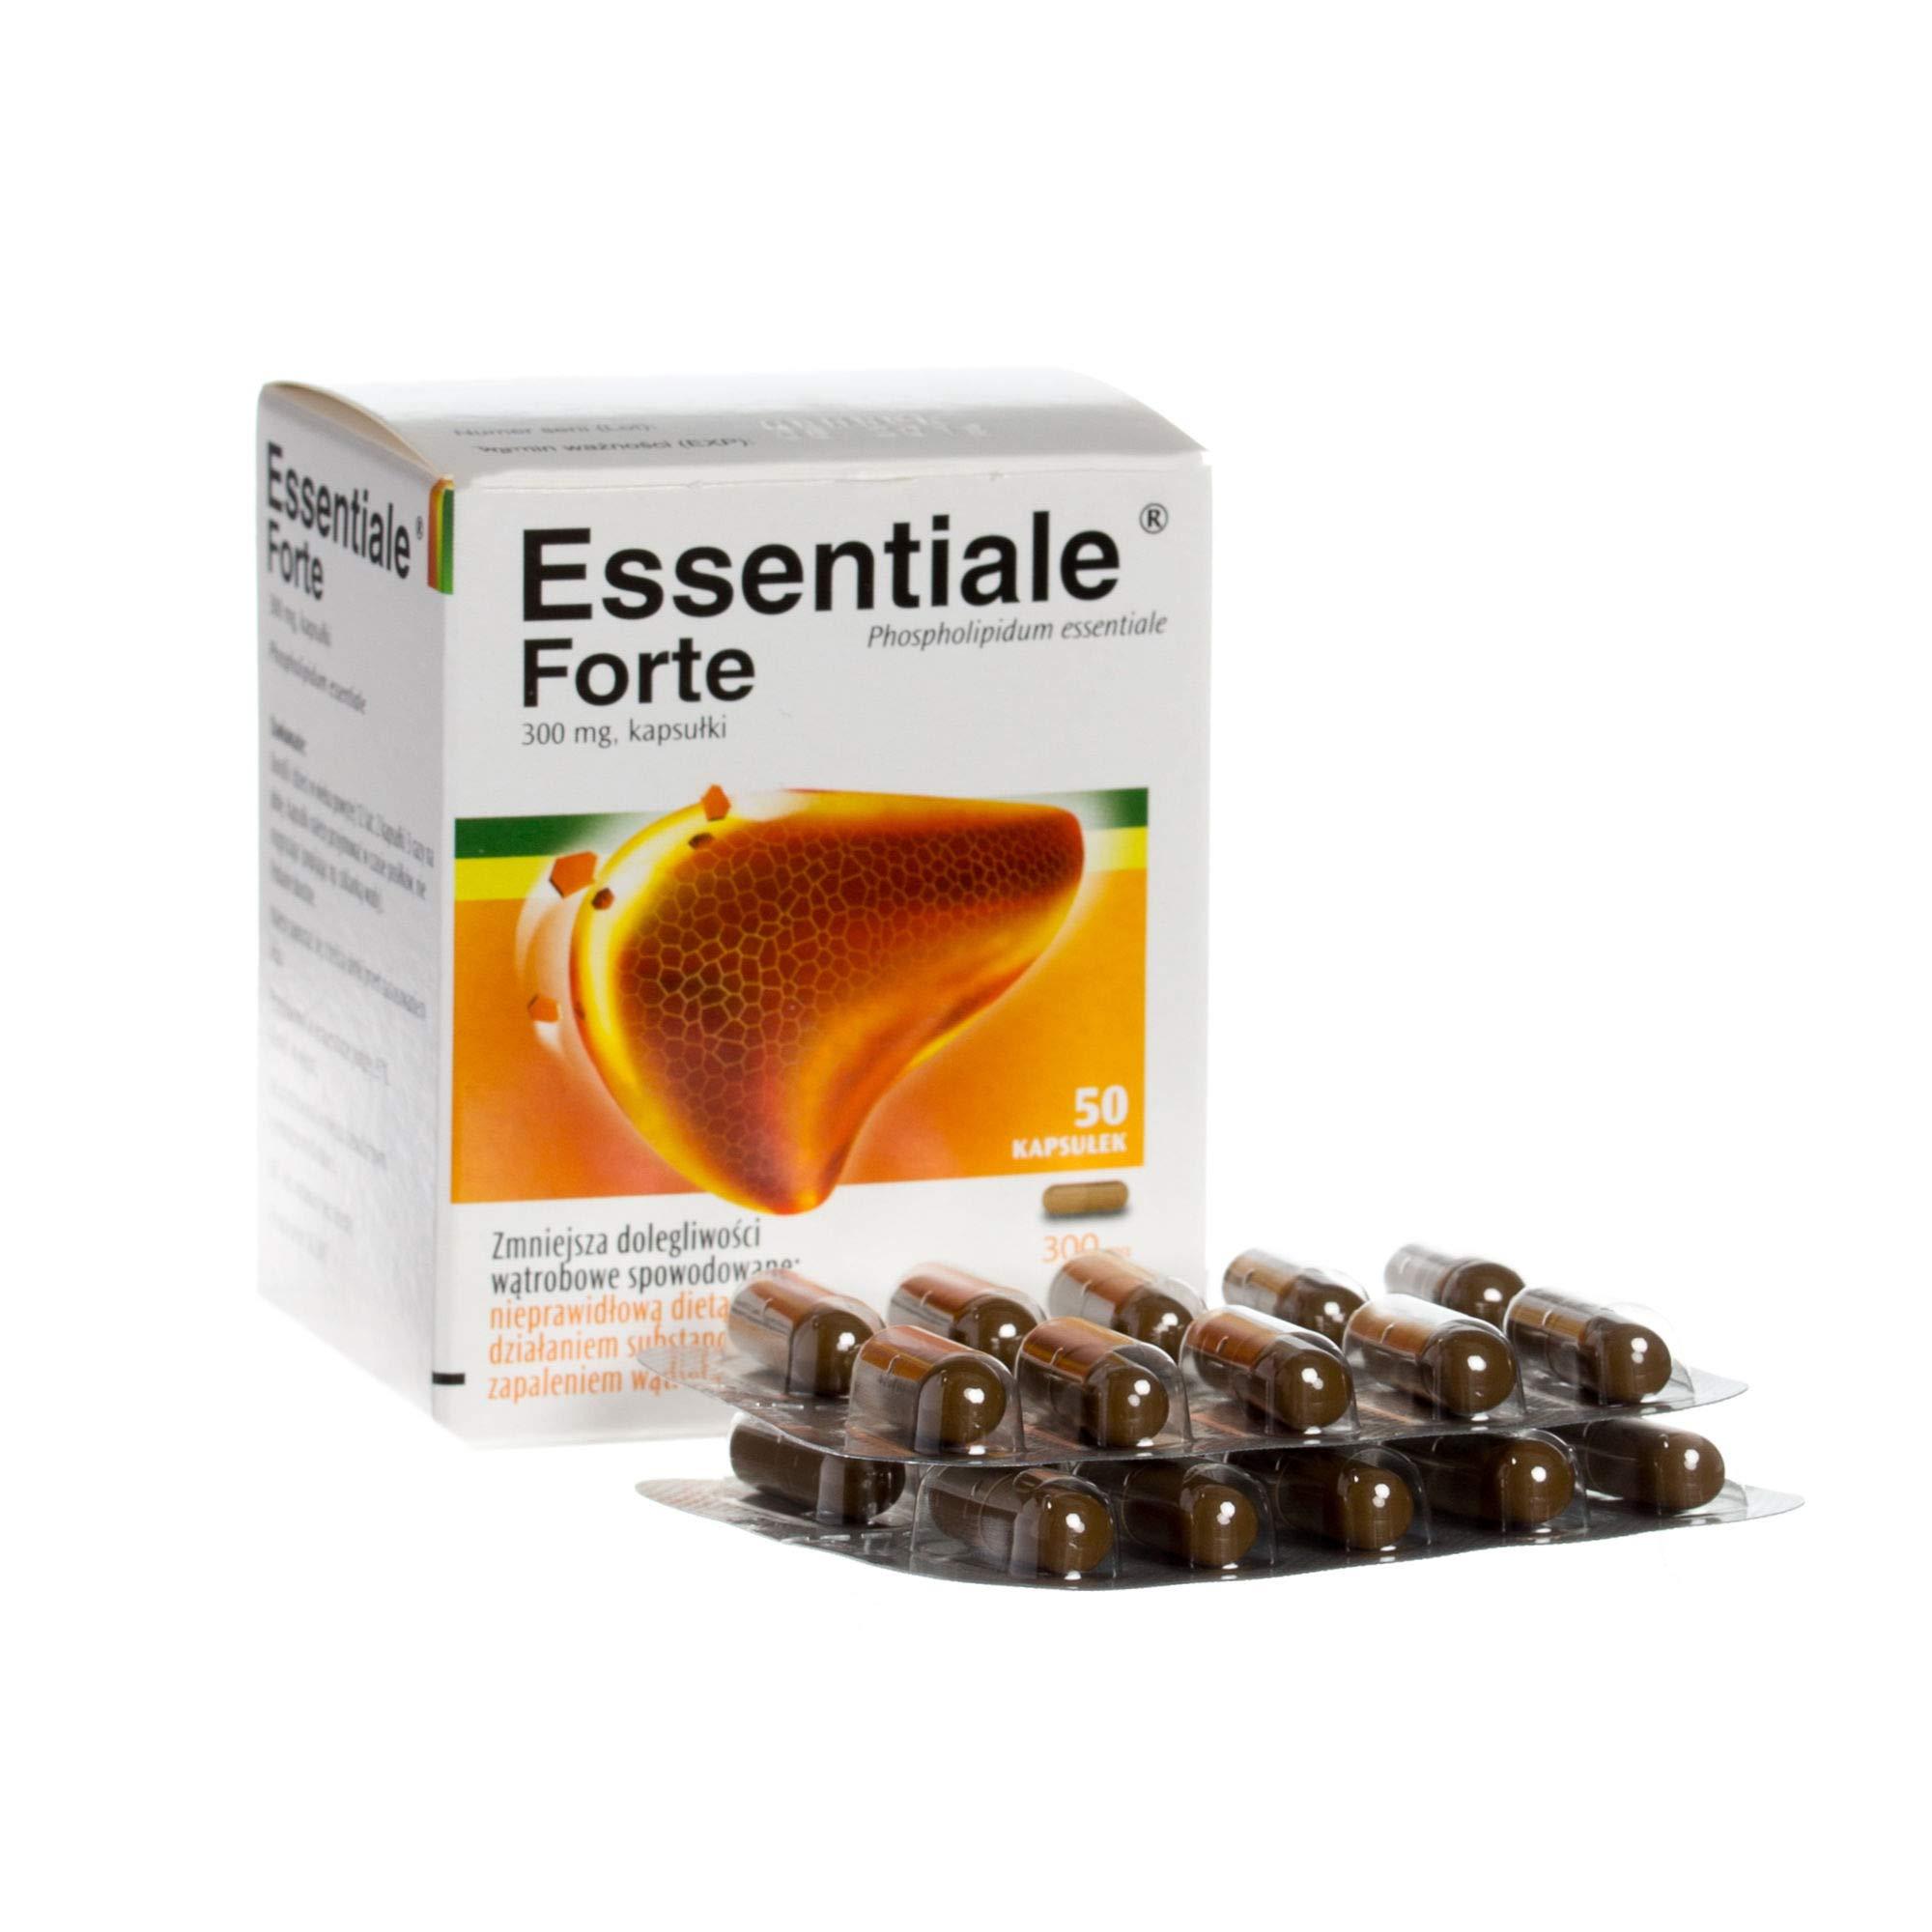 3 x ESSENTIALE Forte 50 TABS - Total 150 TABS by SANOFI